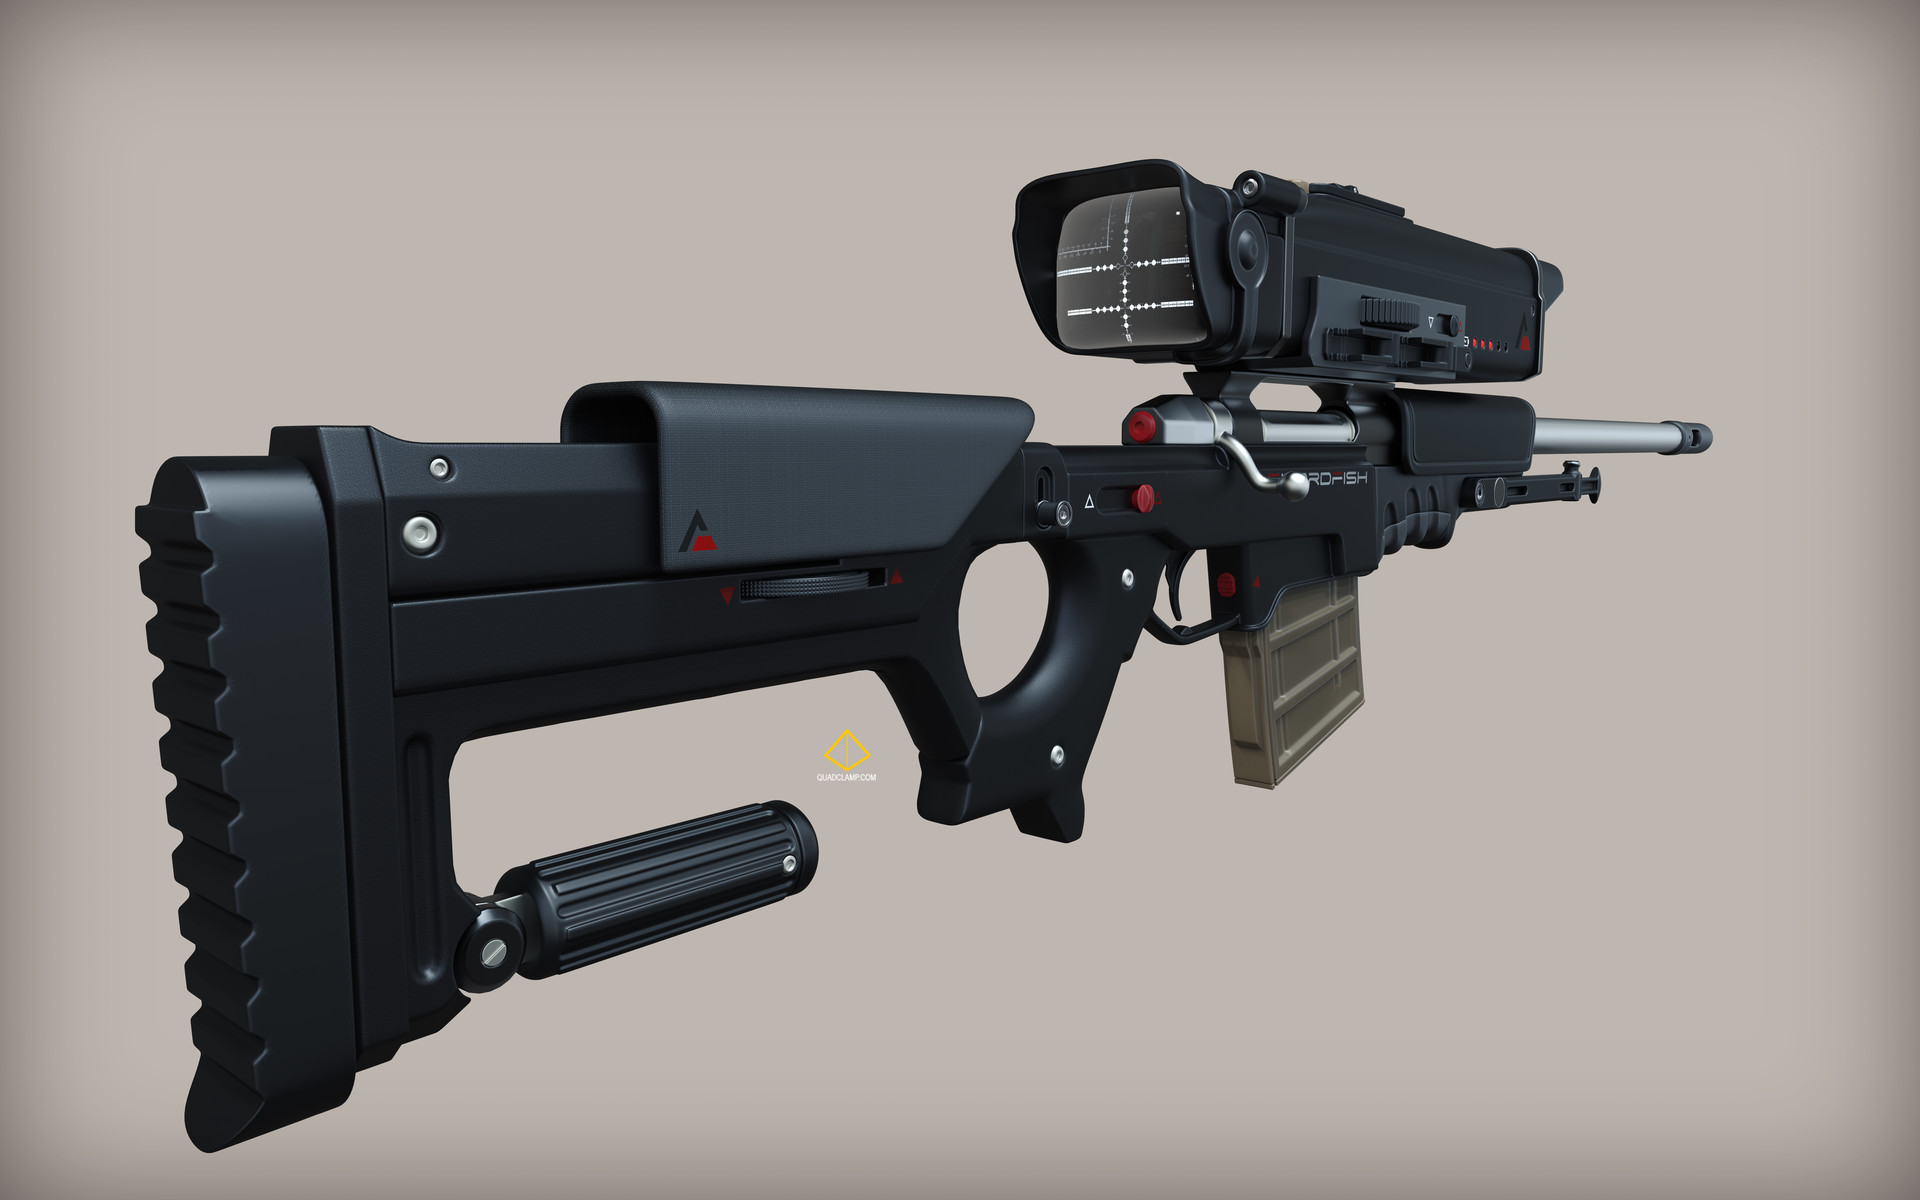 Jordan moss swordfish gun 3quarterrear